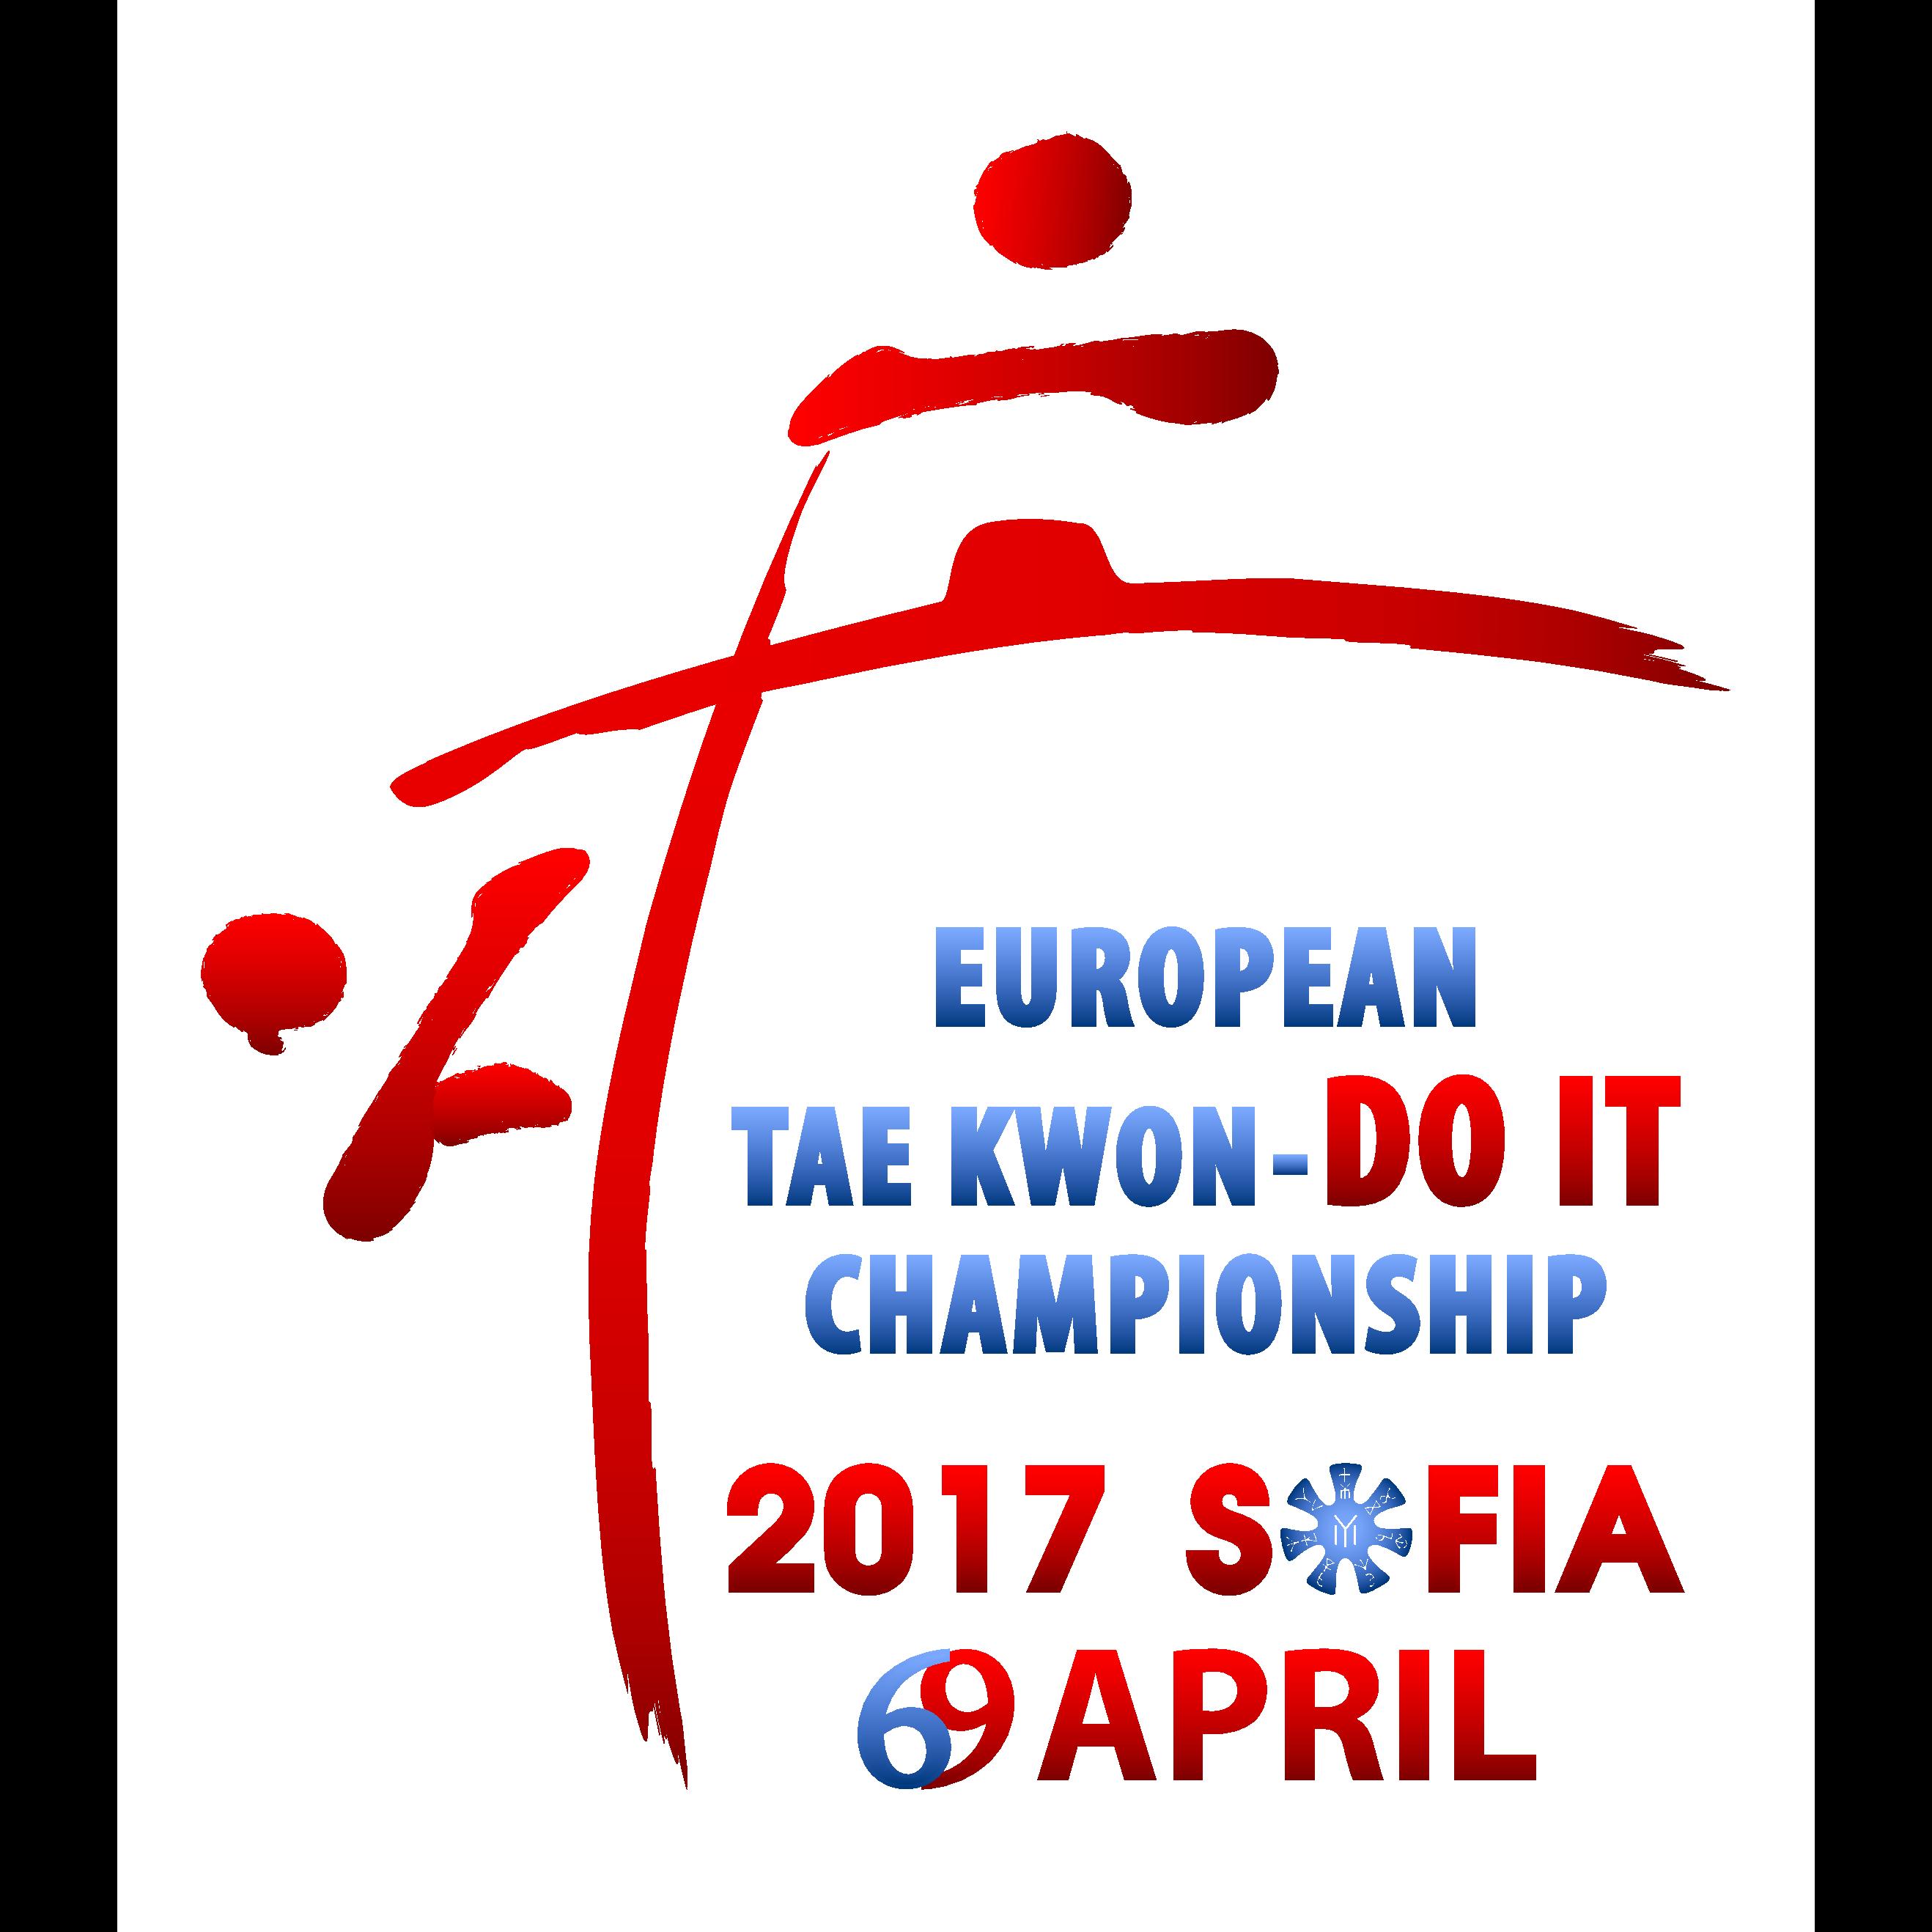 2017 European Taekwondo Under 21 Championships